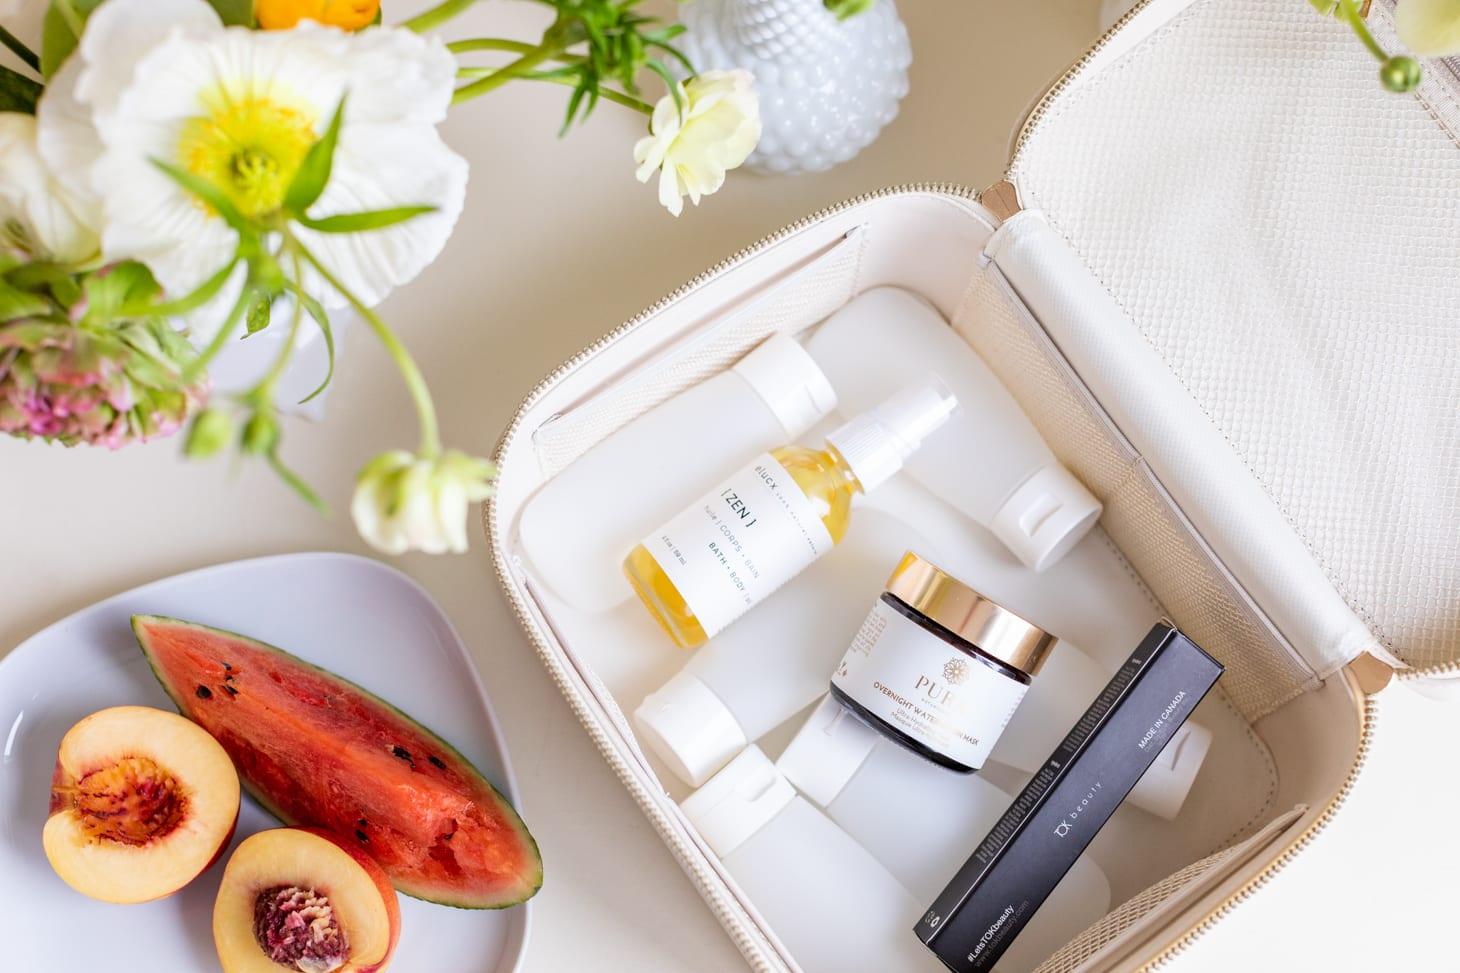 Elucx Zen Body Oil in the Summer Jilly Box